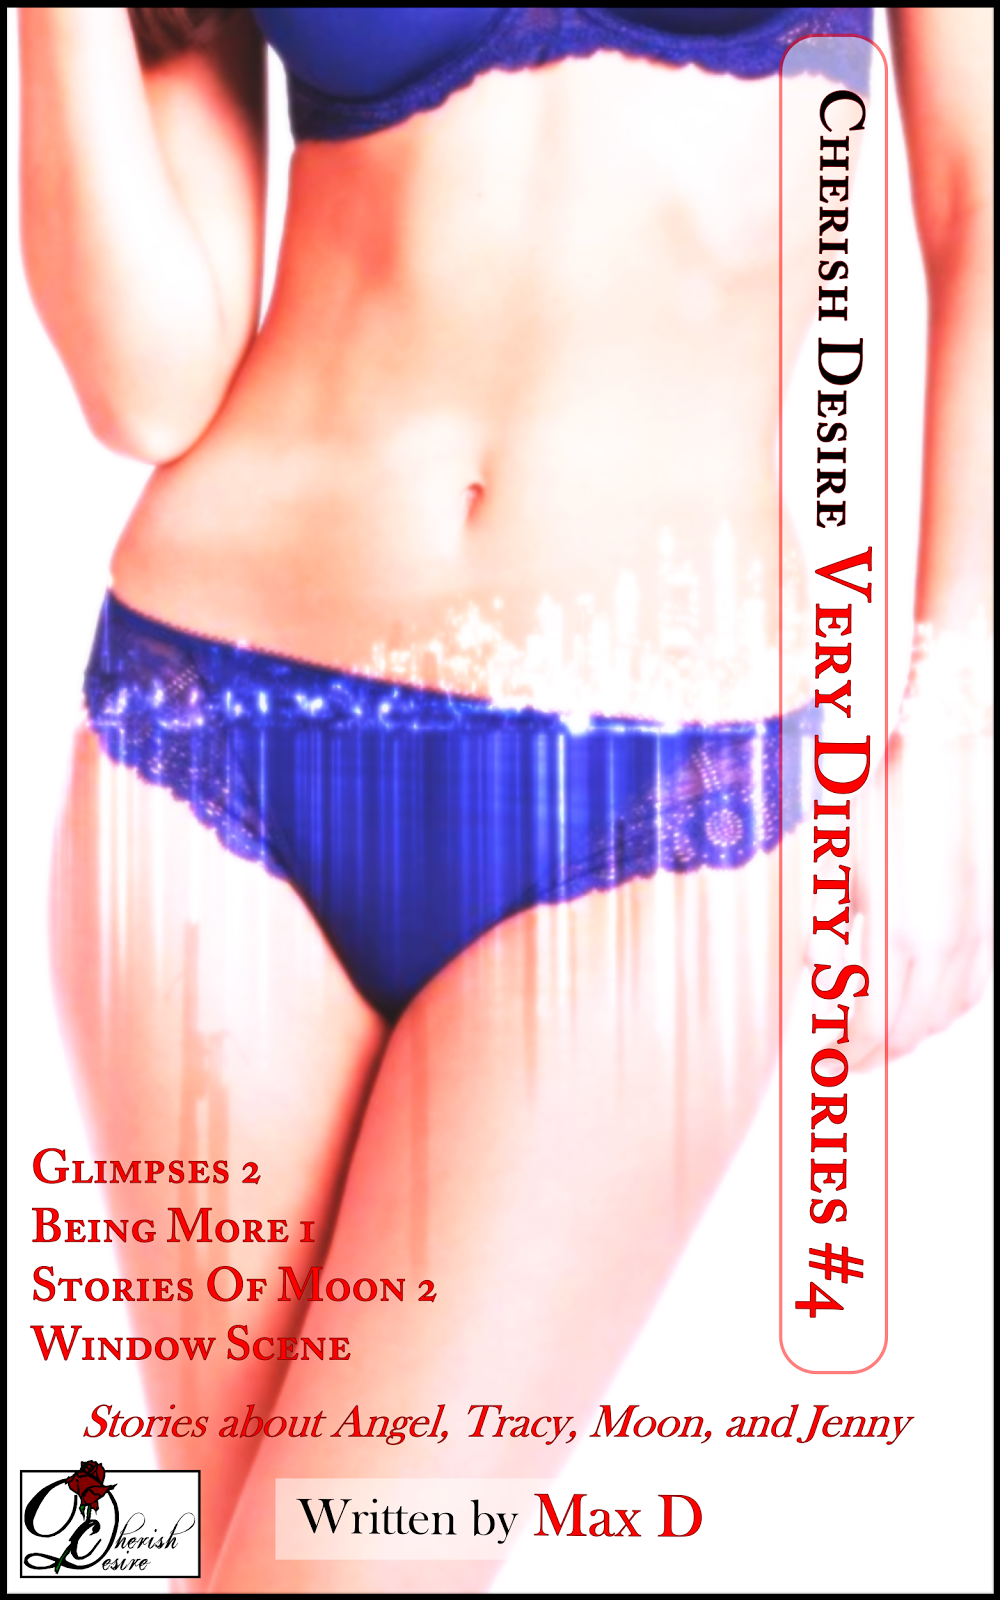 Cherish Desire: Very Dirty Stories #4, Max D, erotica